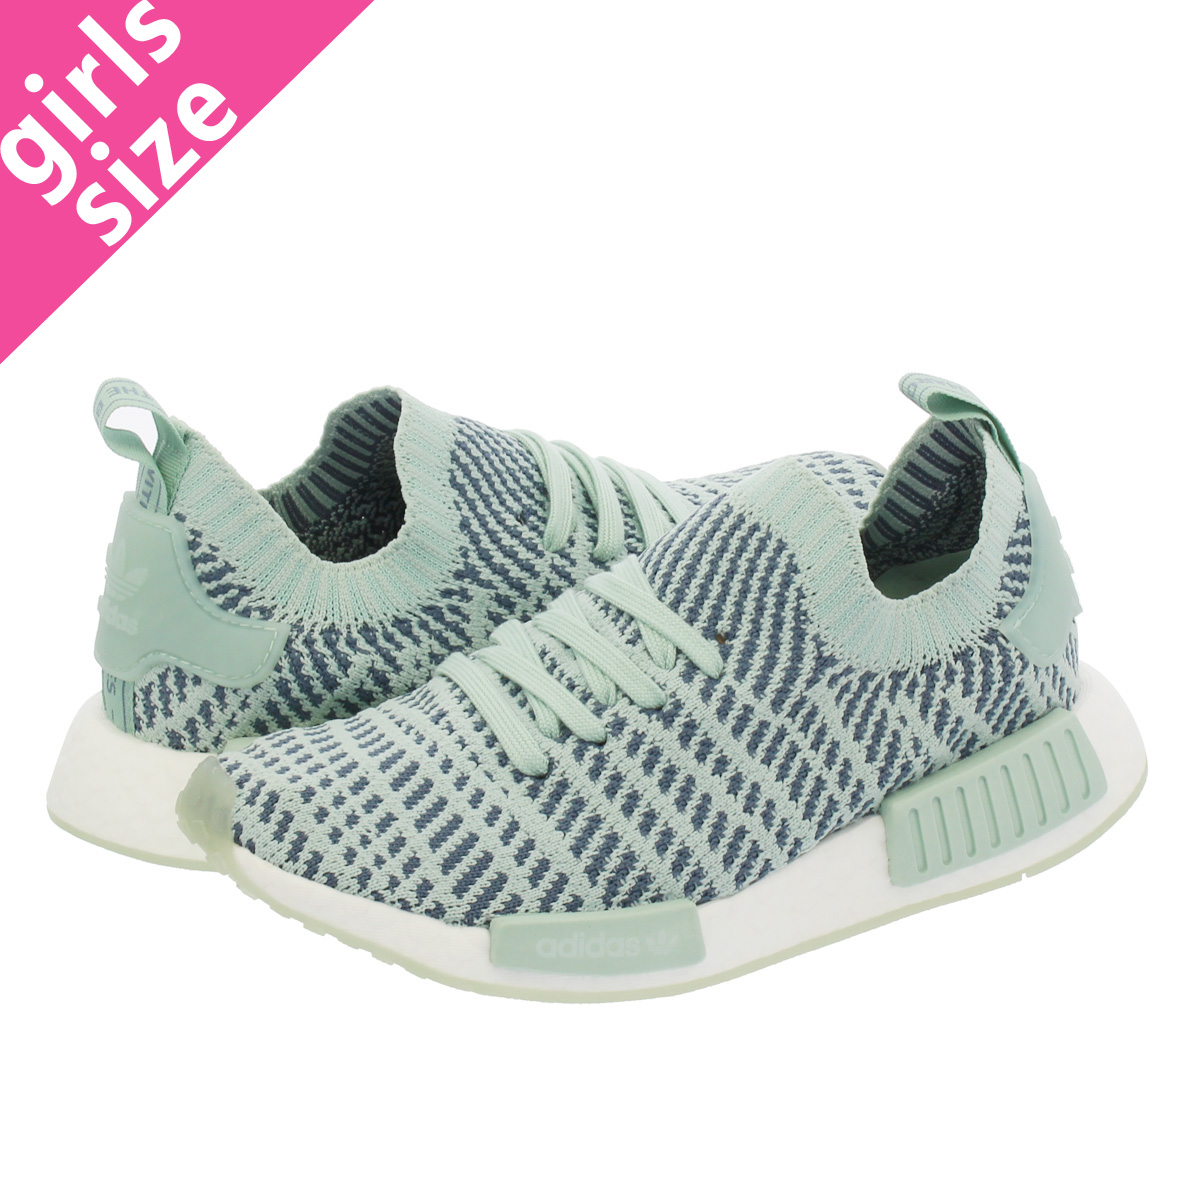 huge discount 10e4e 9322e adidas NMD_R1 STLT PK W Adidas NMD R1 STLT PK W ASH GREEN/LOW STEEL/RUNNING  WHITE RAW